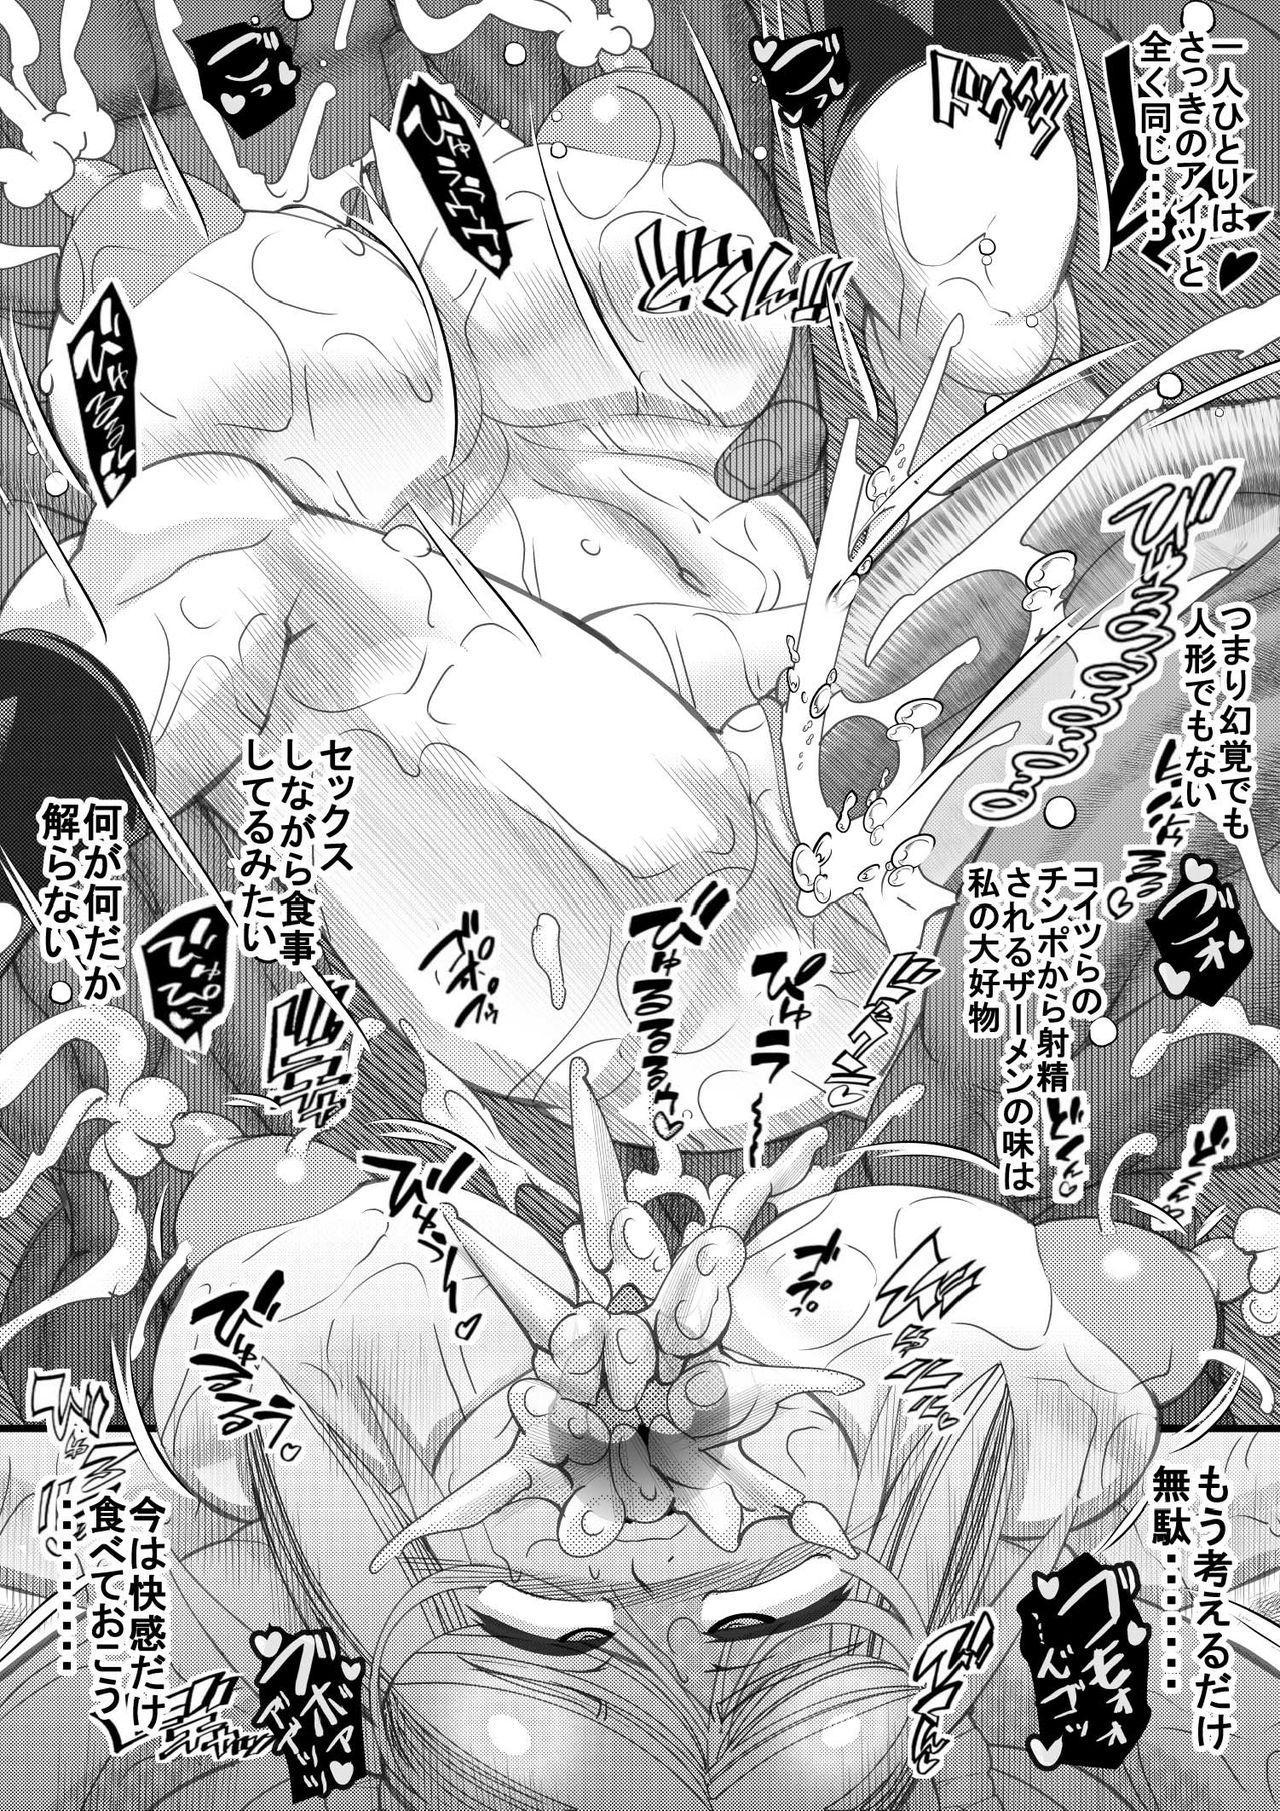 Haramachi 9 26